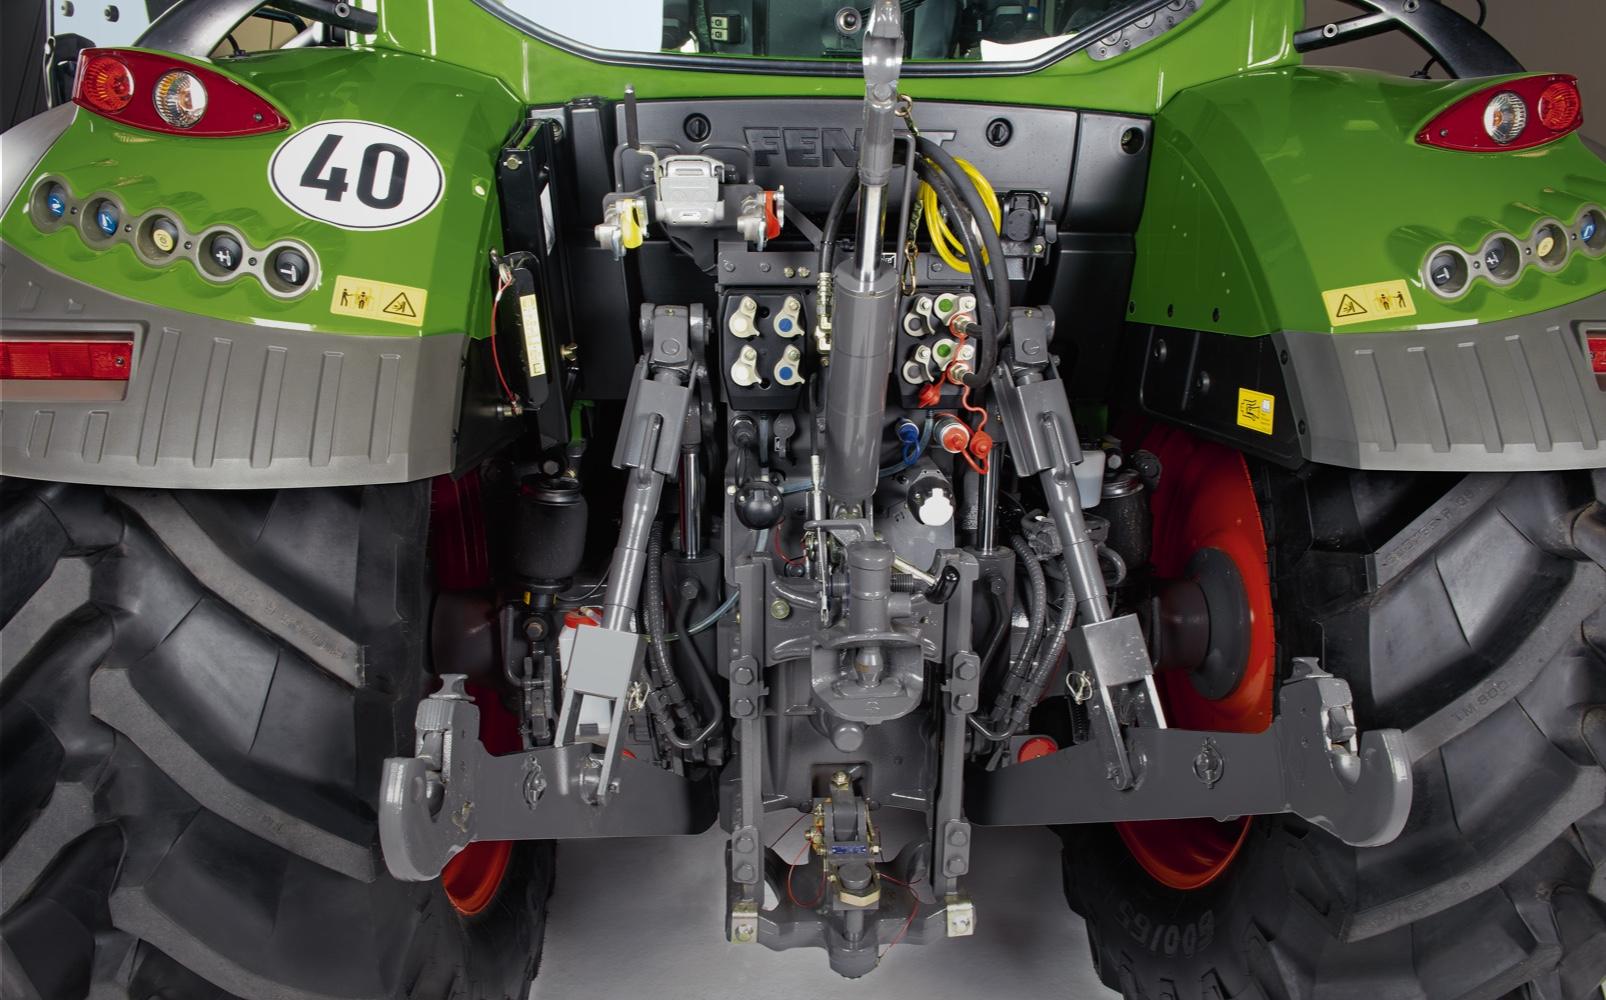 fendt300variohidraulica2x